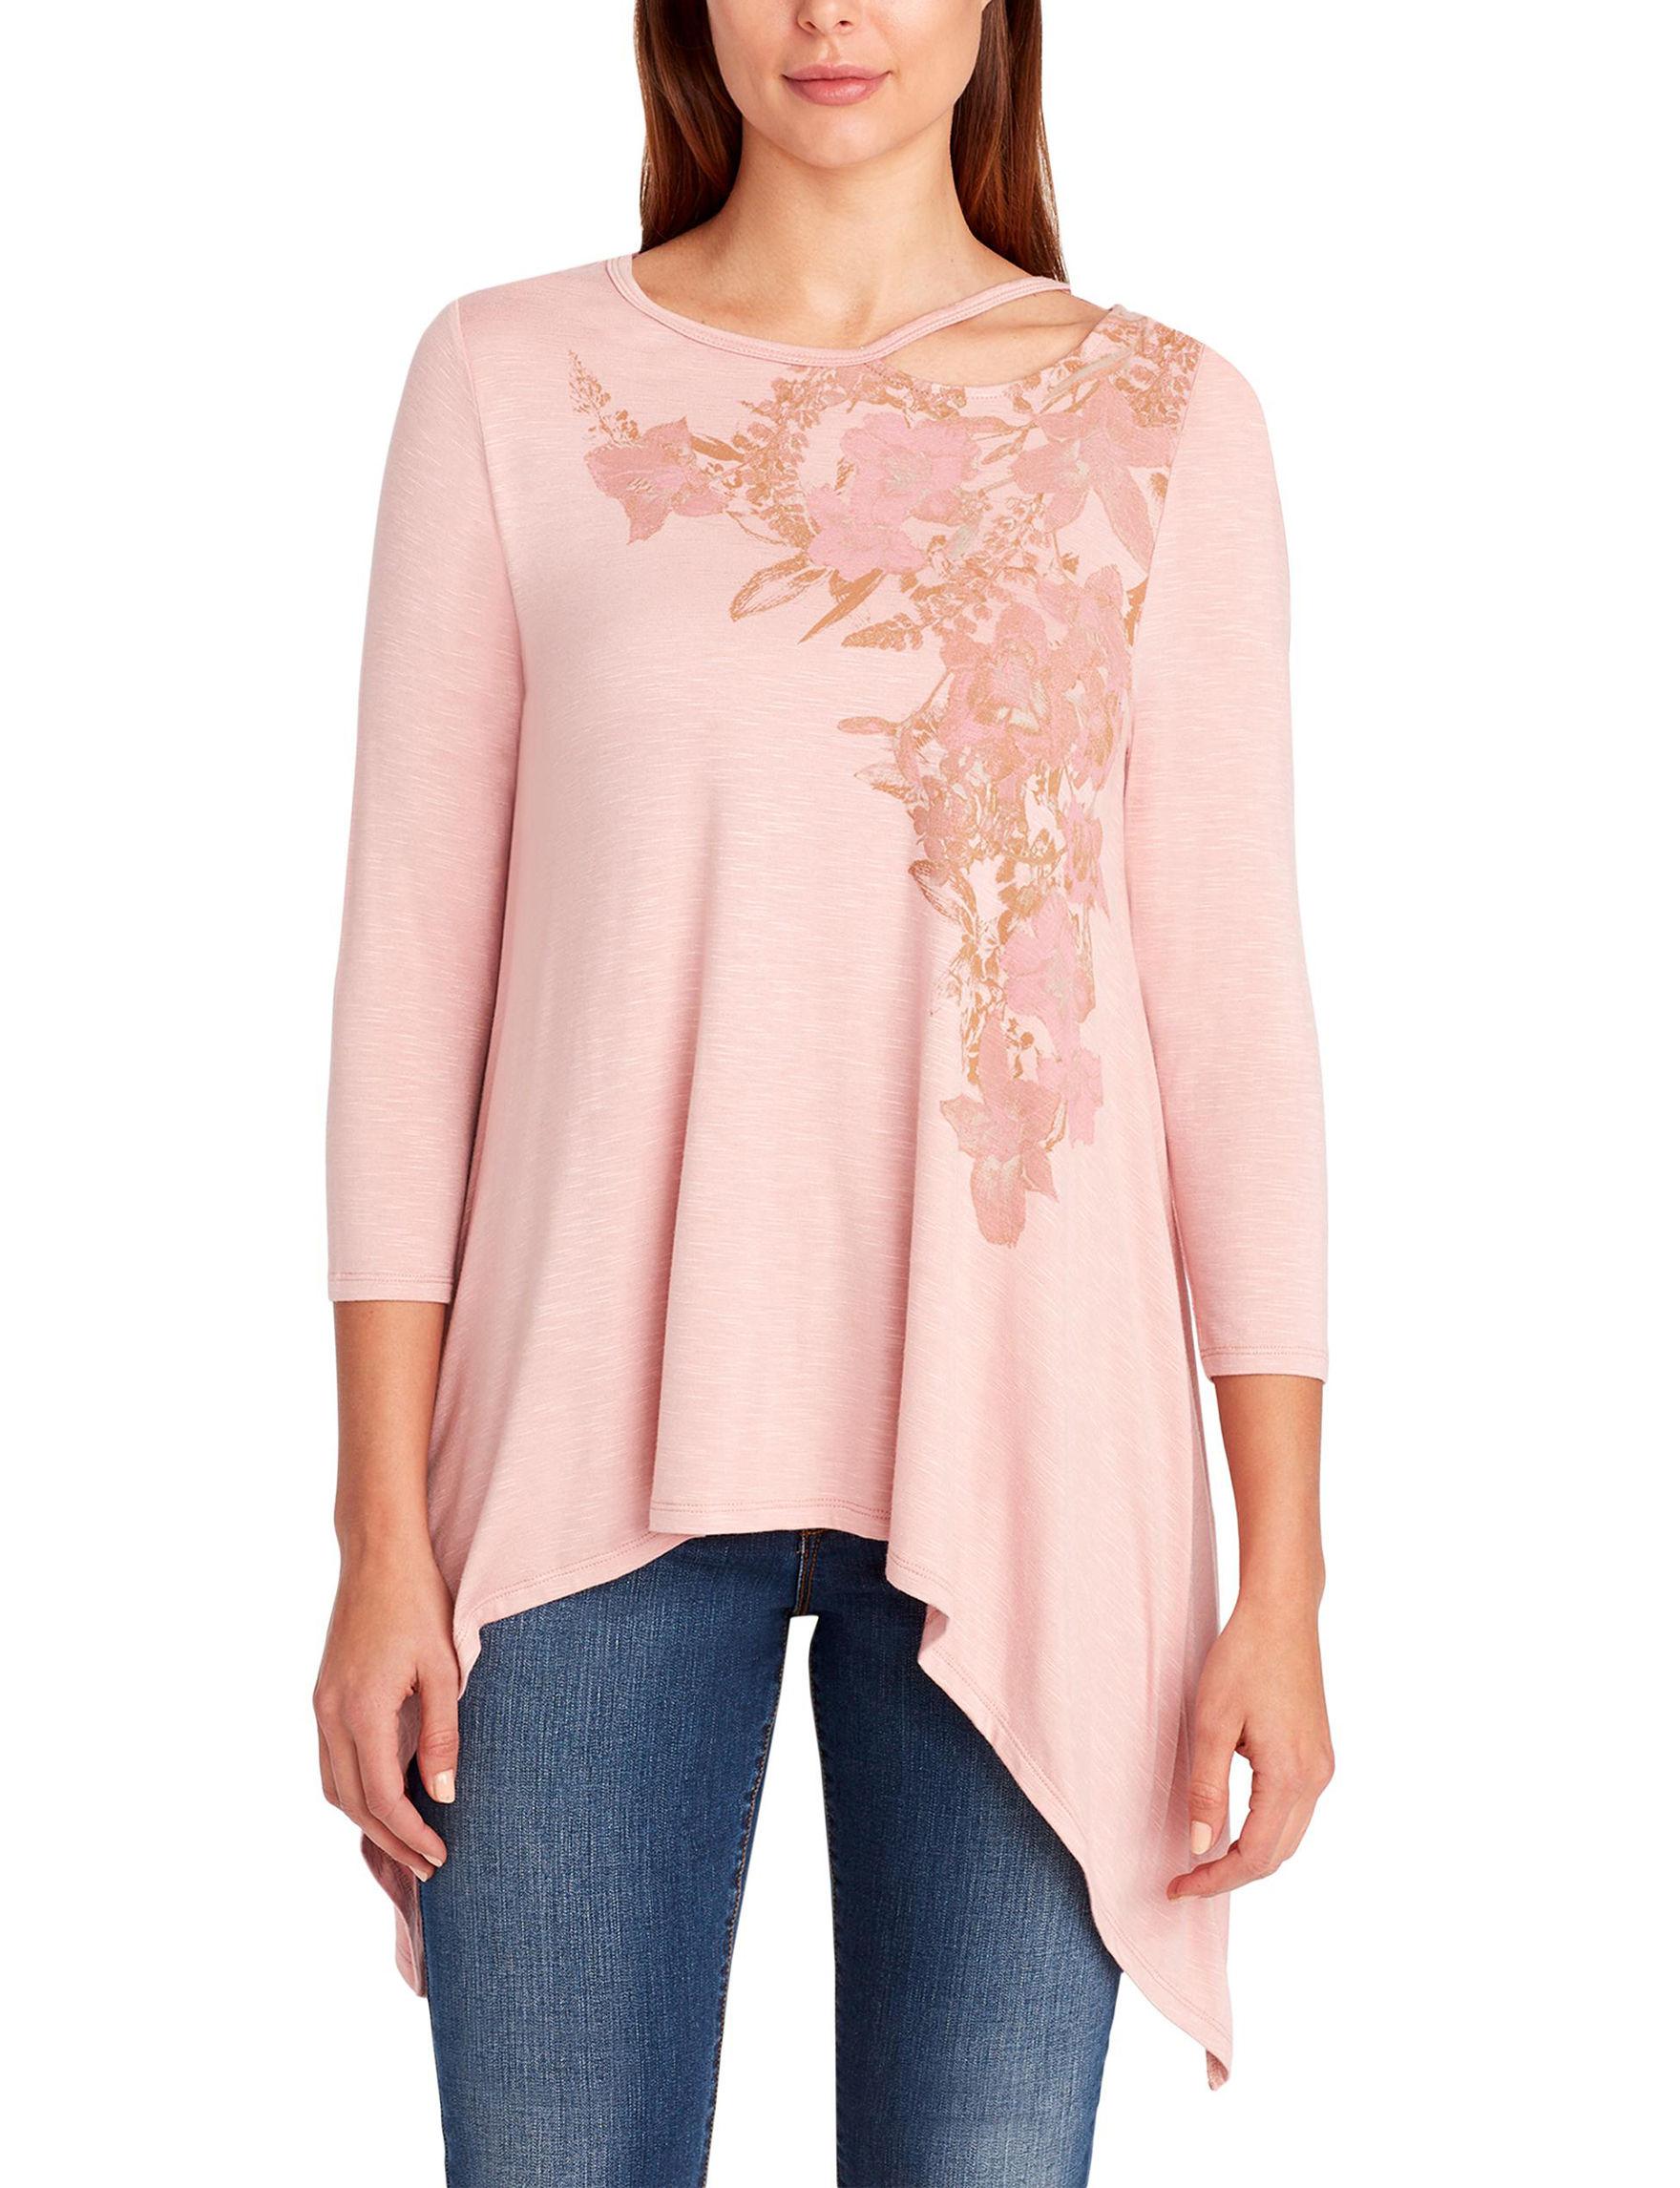 Nine West Pink Shirts & Blouses